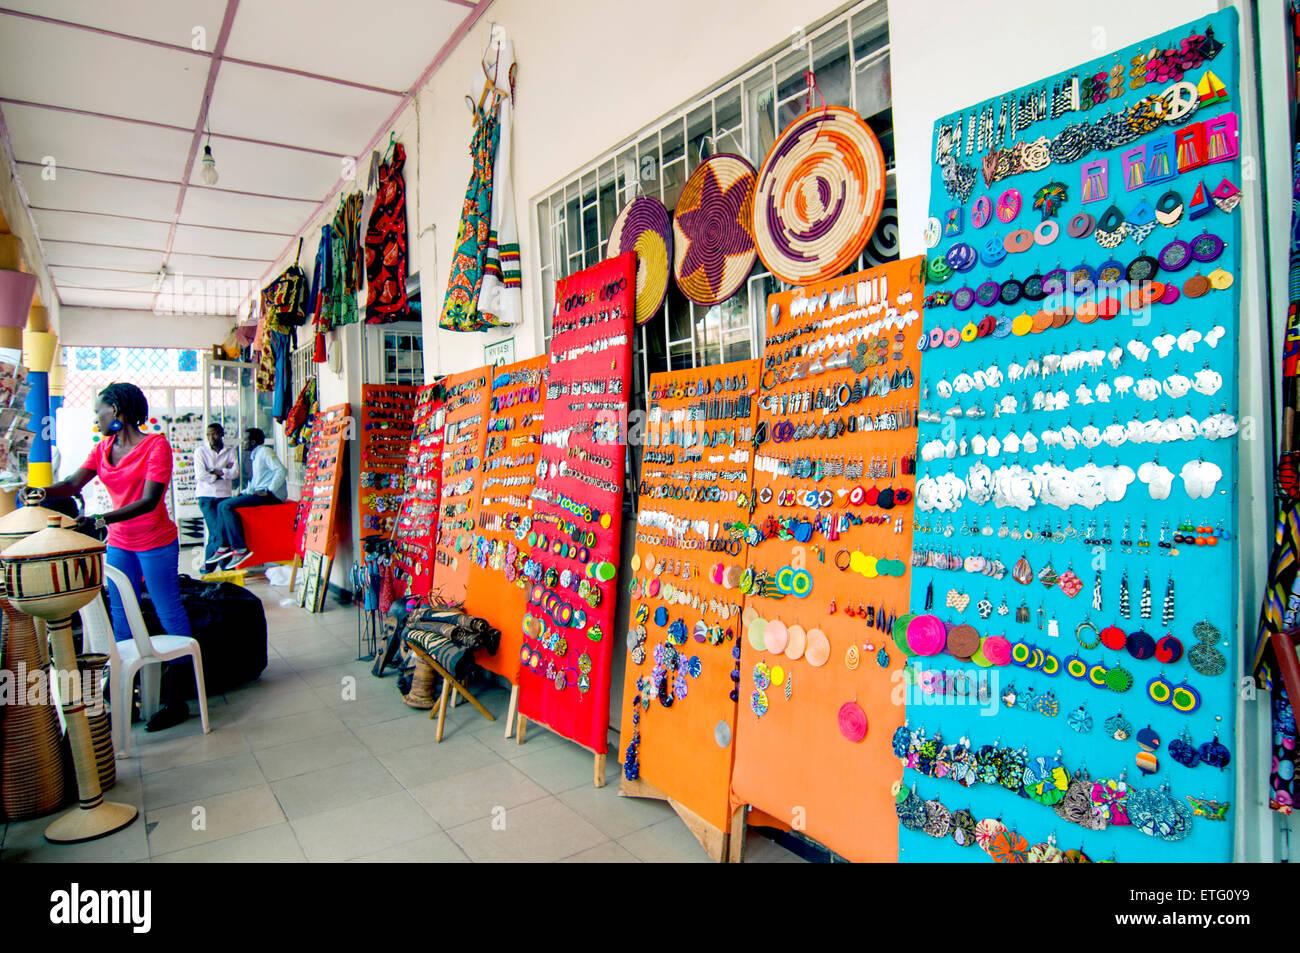 handicraft stores, 'Central Ville', CBD, Kigali, Rwanda - Stock Image